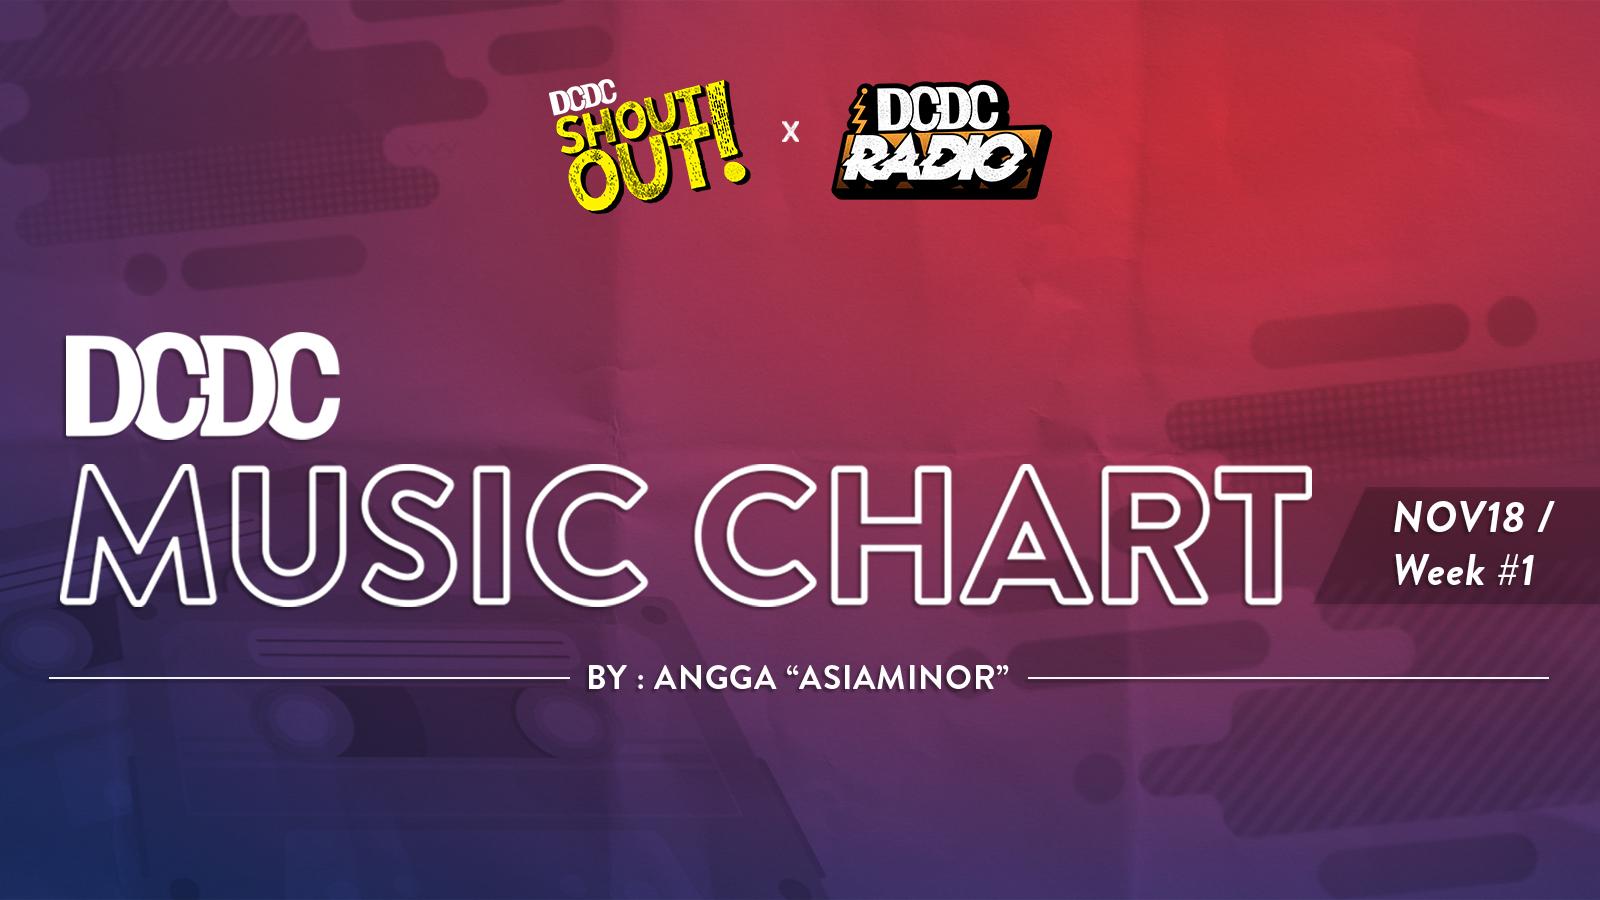 DCDC Music Chart - #1st Week of November 2018